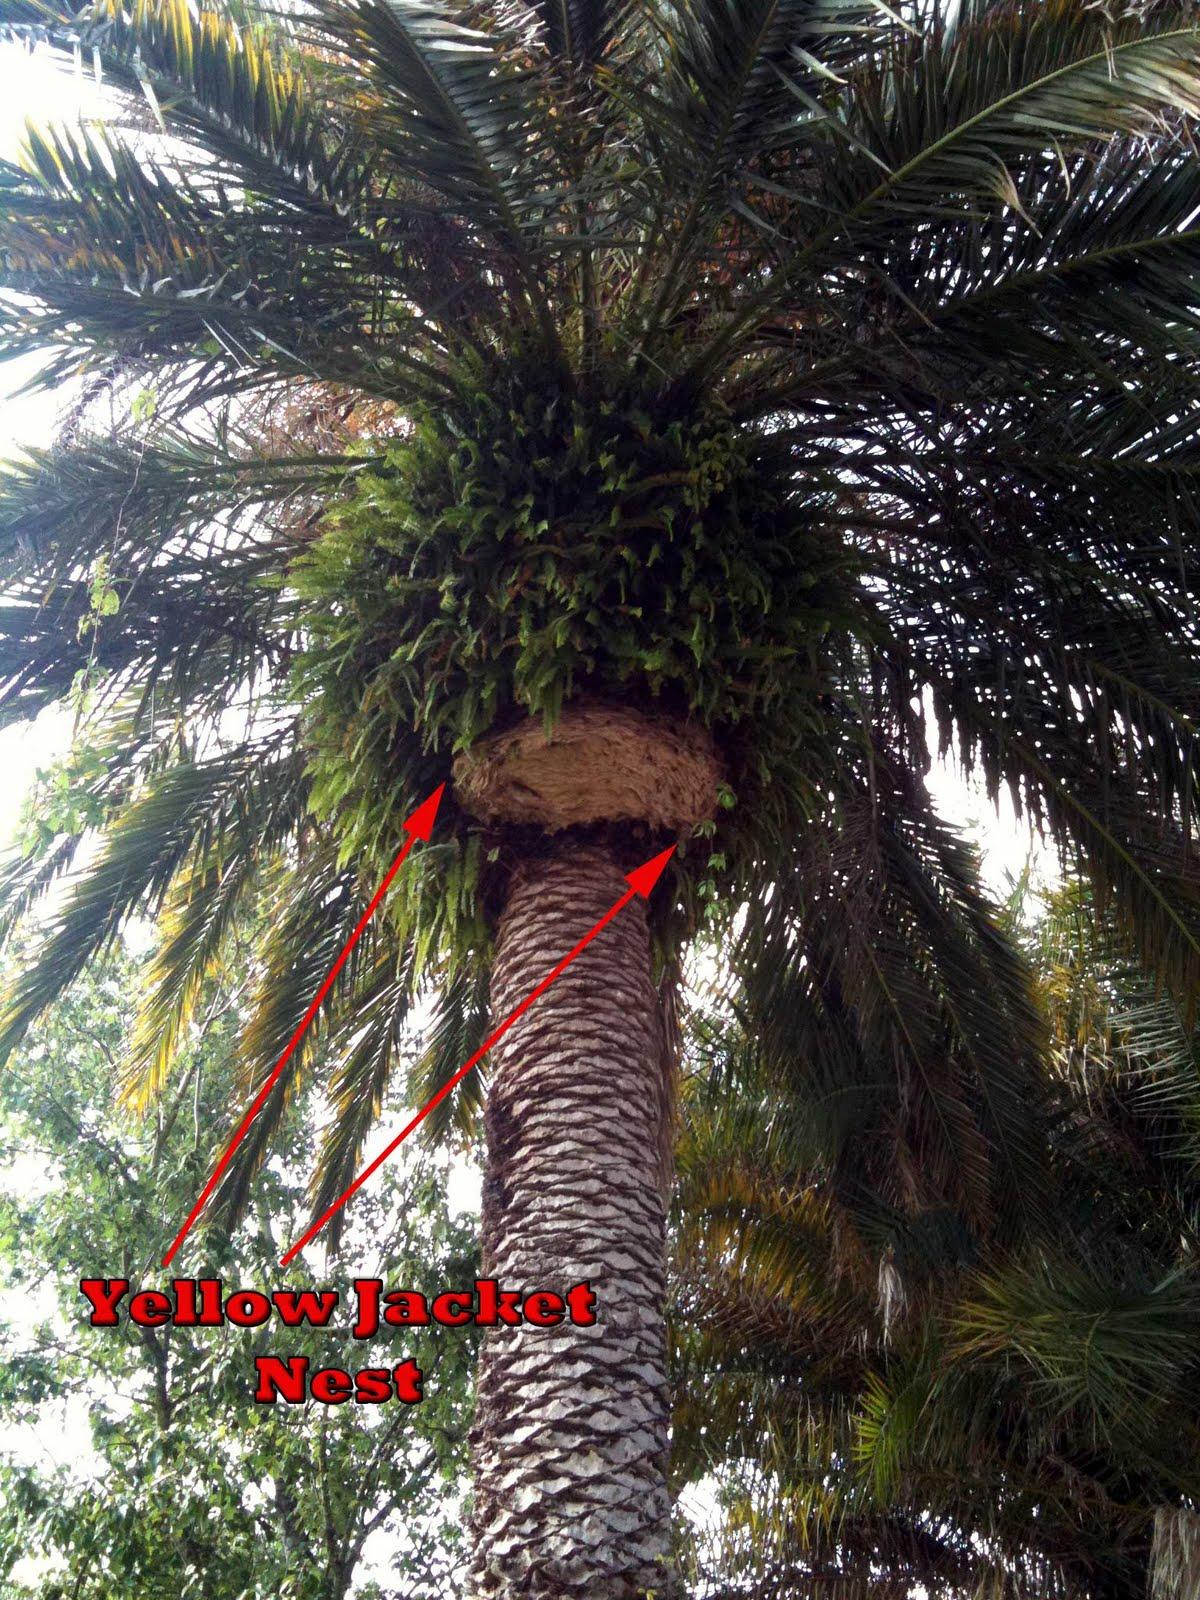 Largo Yellow Jacket nest in Palm